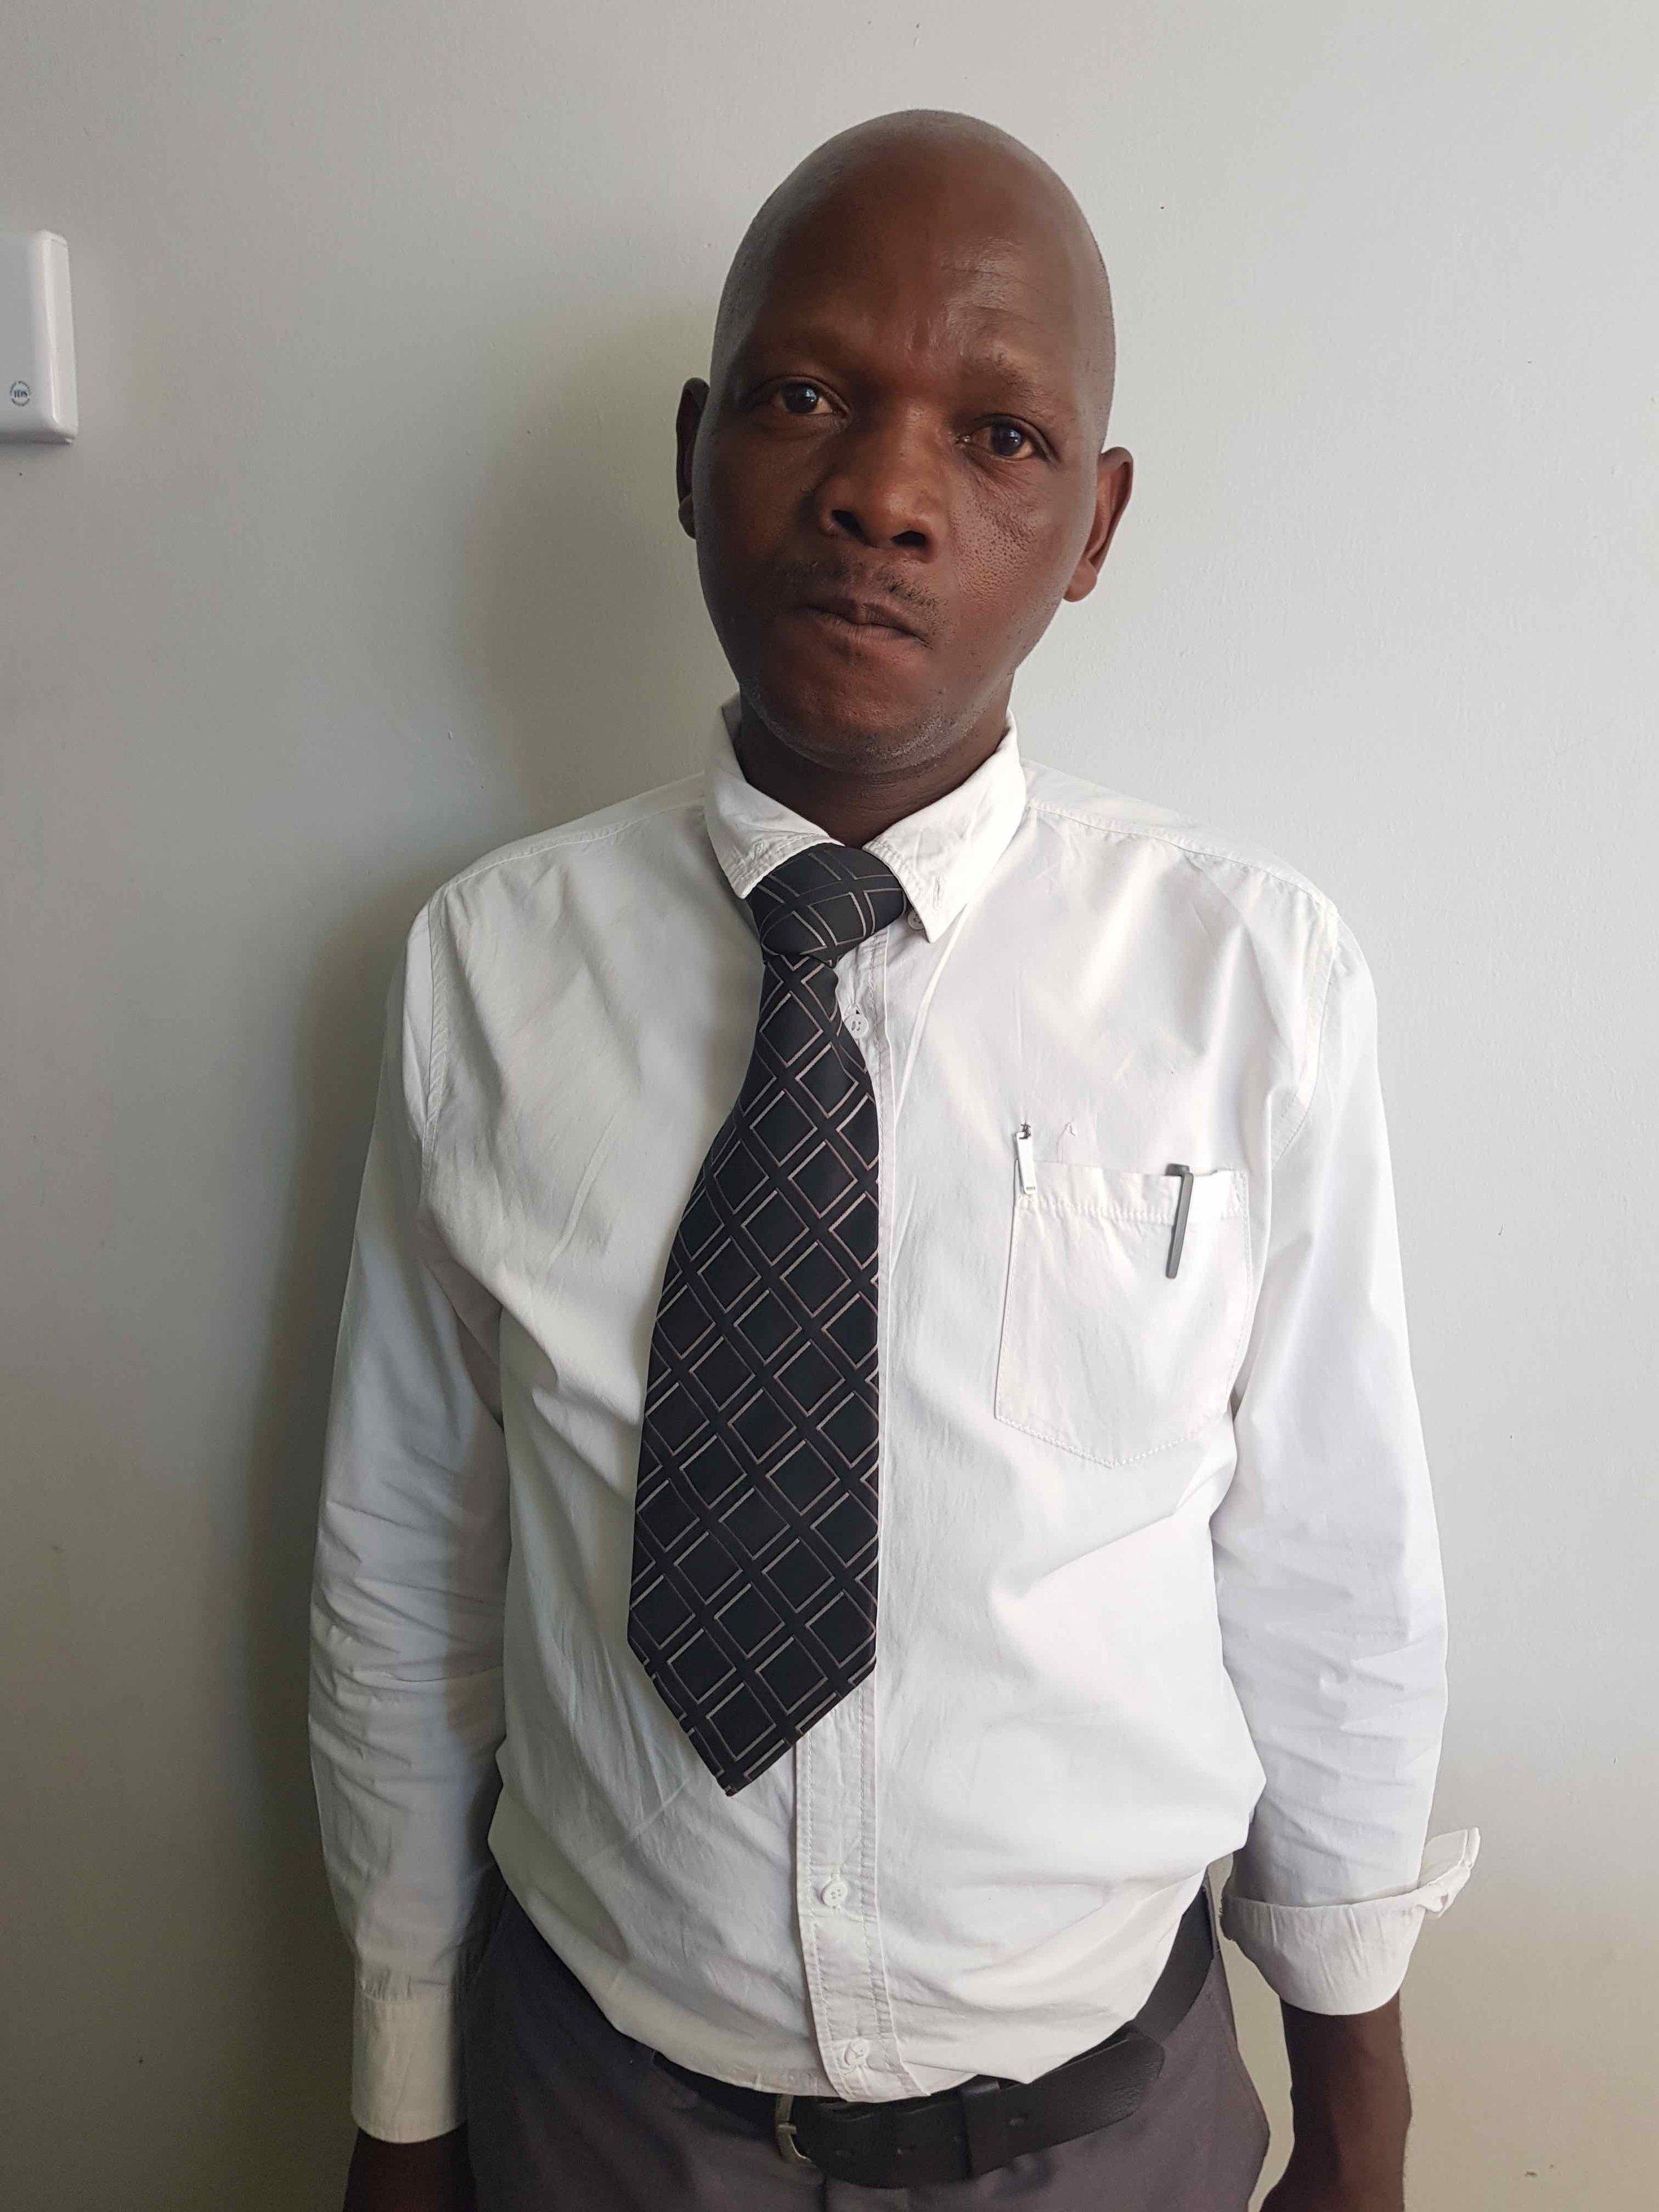 Letlhakeng Mphuthe computer teacher Tshiamonyana -